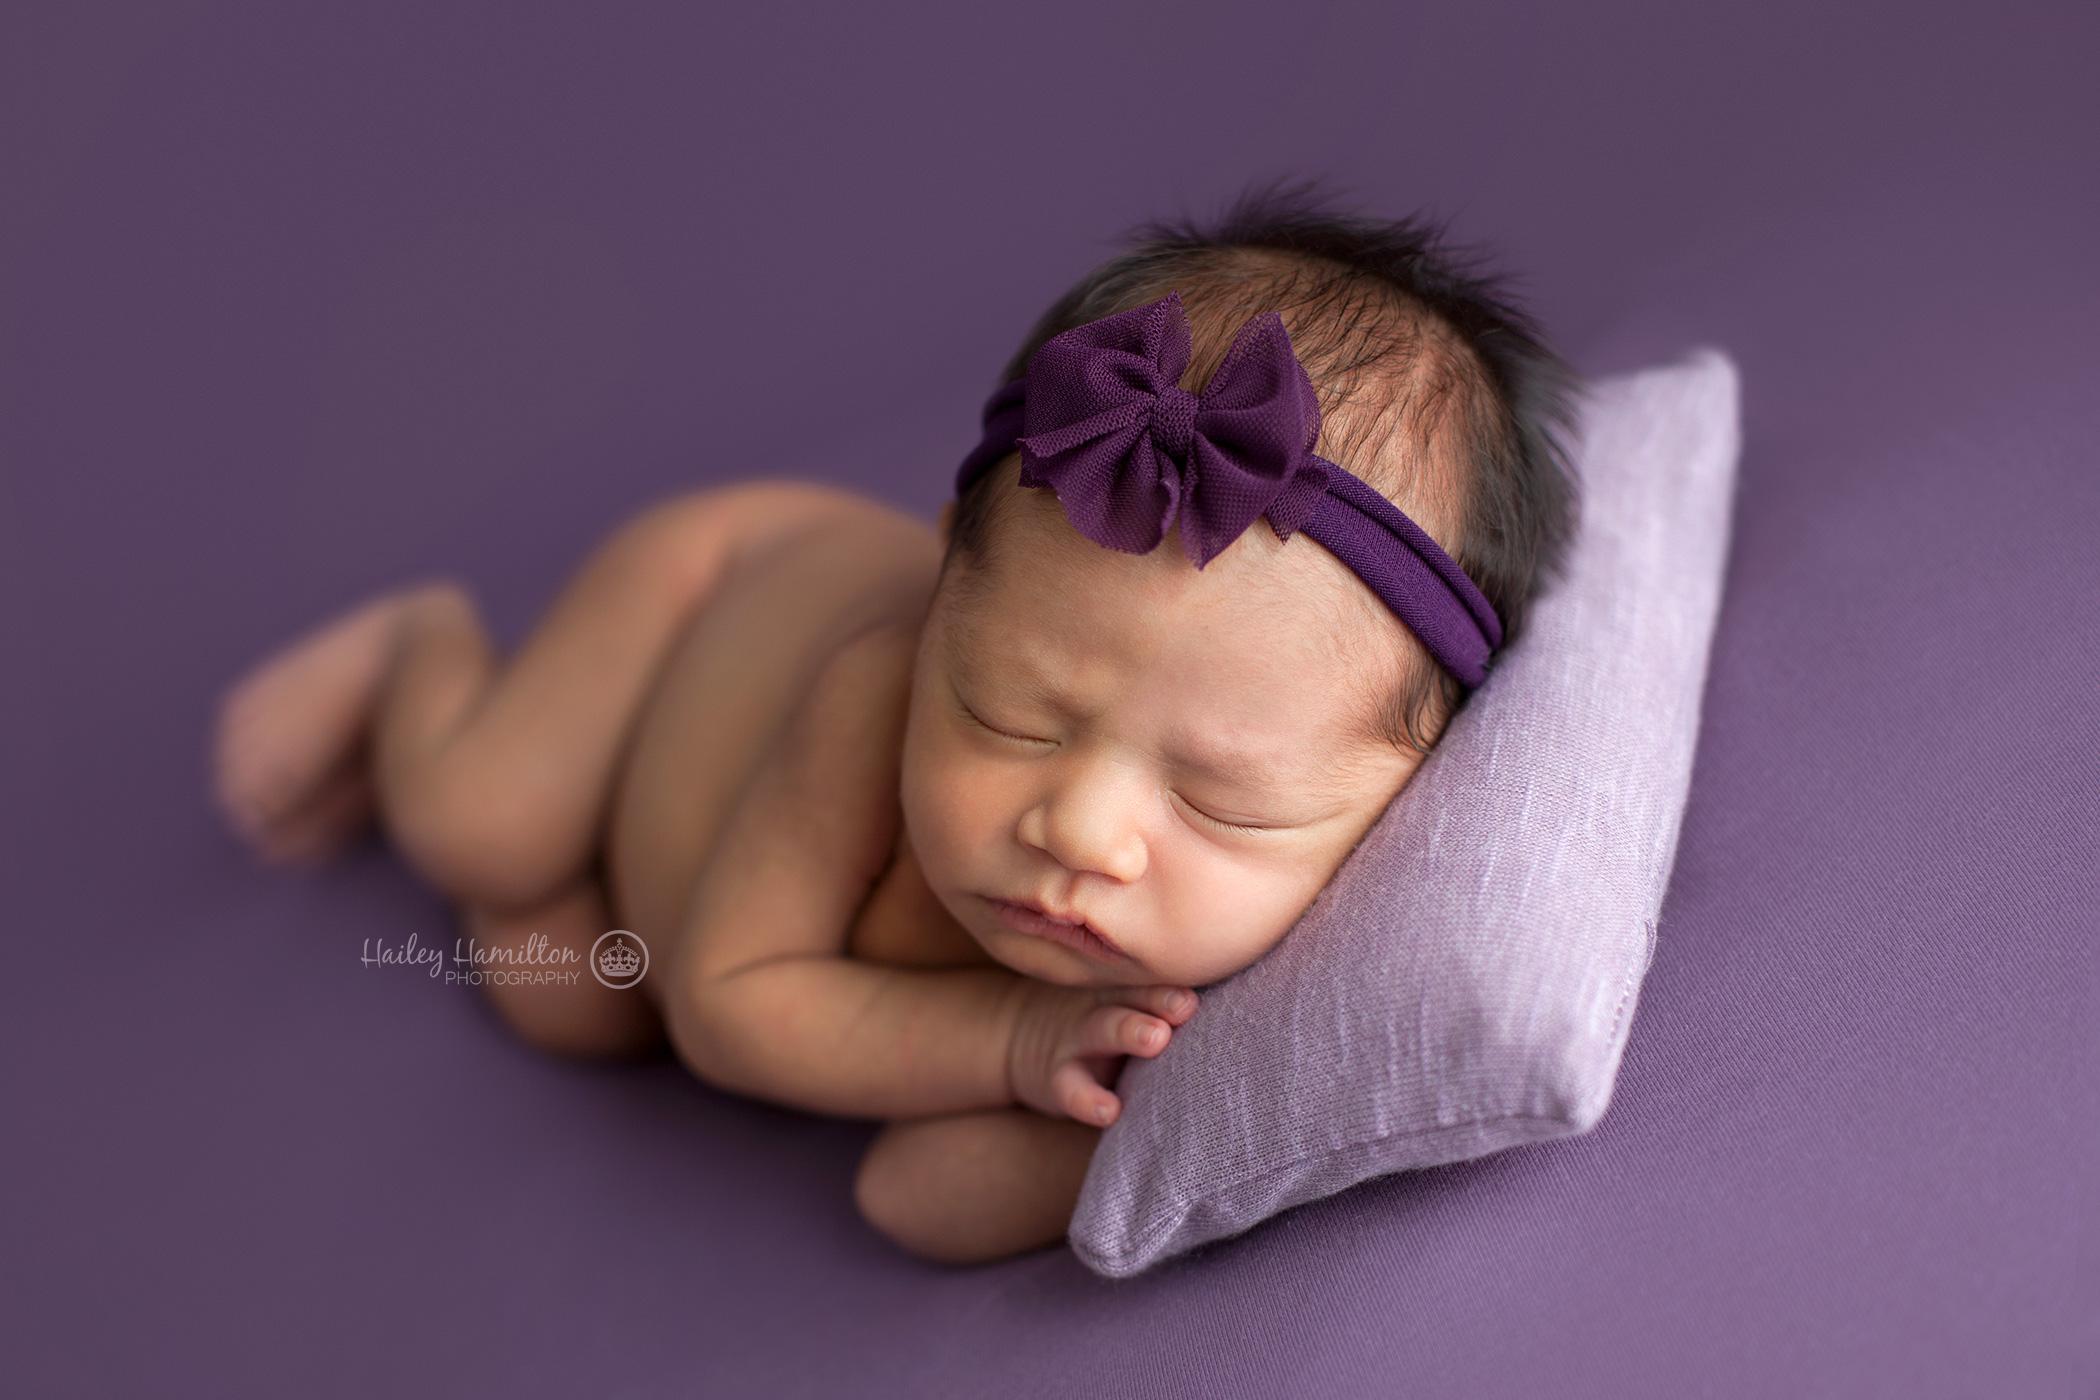 Sleepy newborn girl with purple pillow